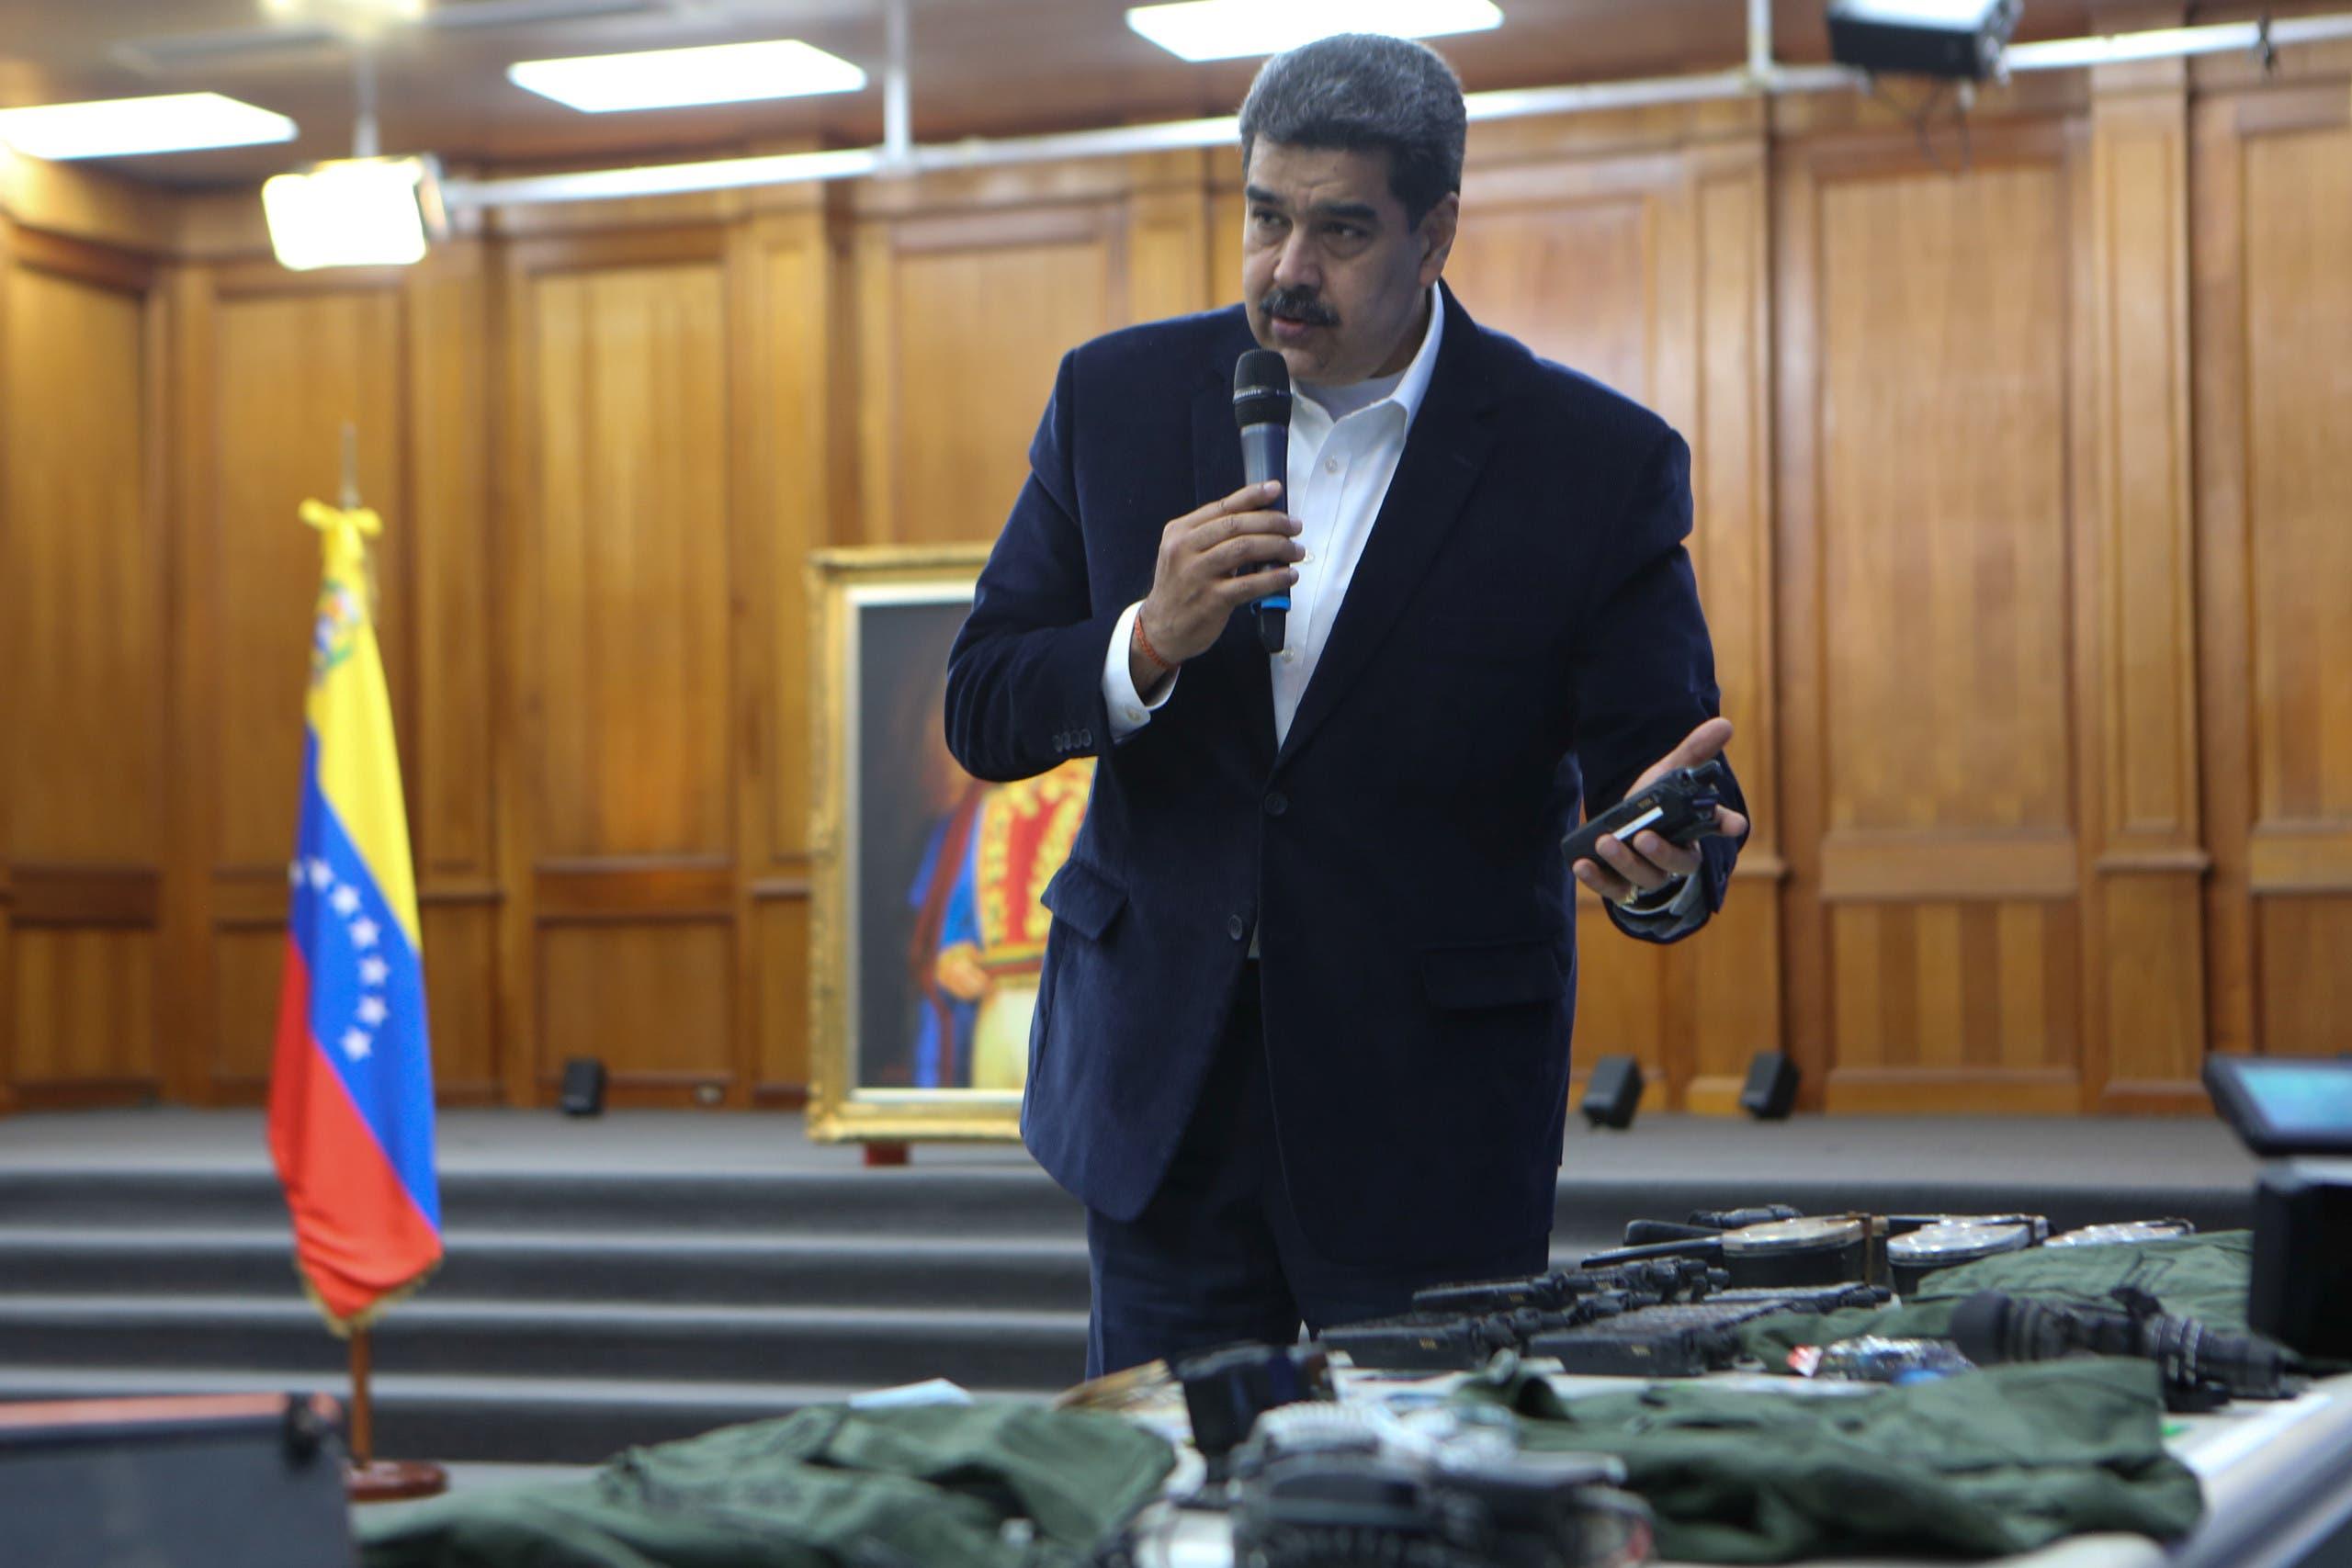 Venezuela's President Nicolas Maduro shows military equipment at Miraflores Palace in Caracas, Venezuela, May 4, 2020. (Miraflores Palace/Handout via Reuters)